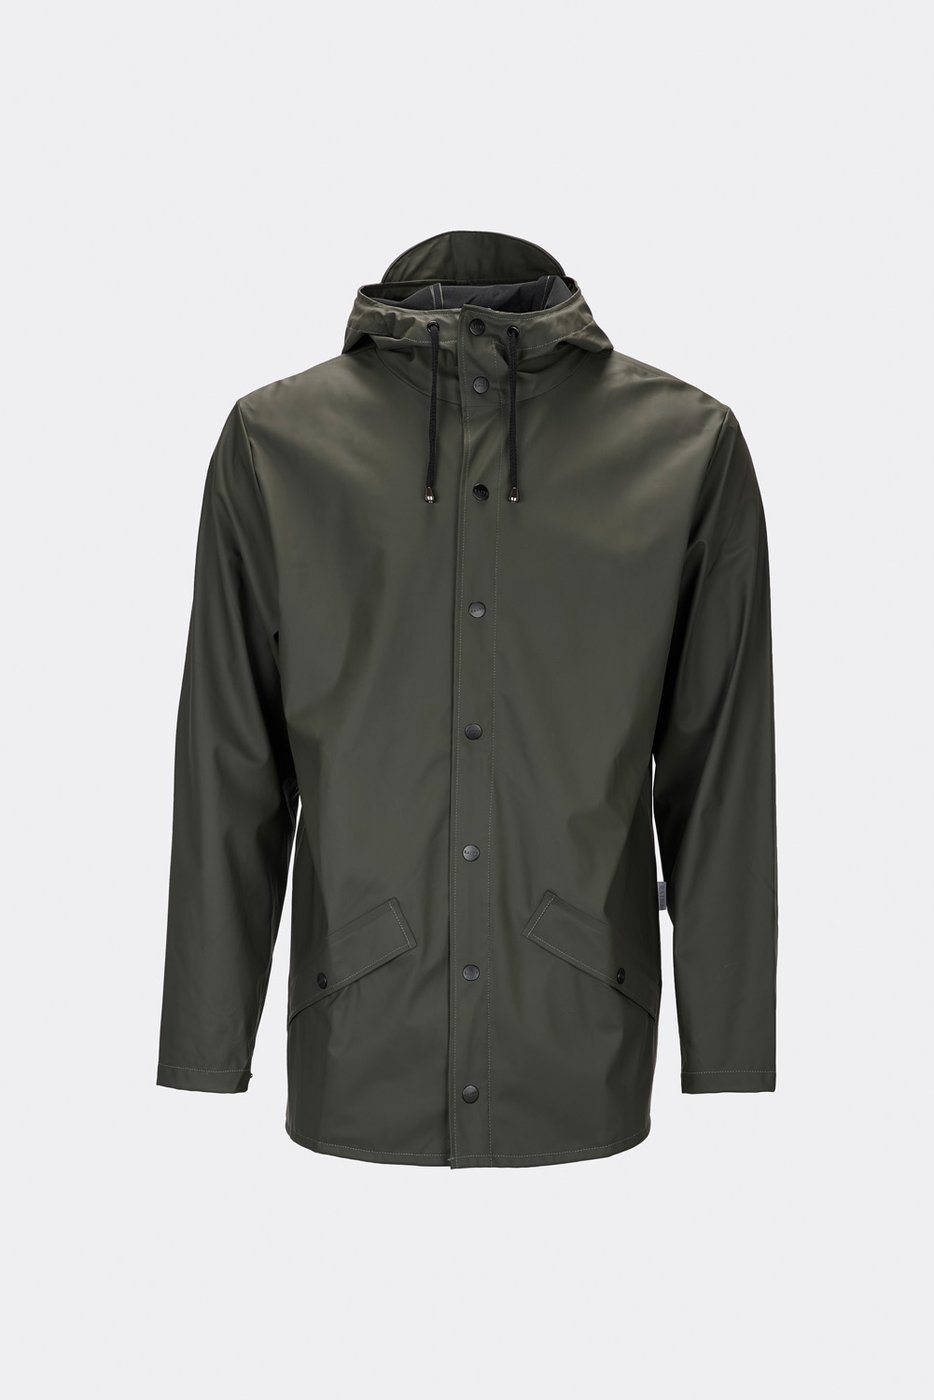 Rains Jacket green unisex S/M